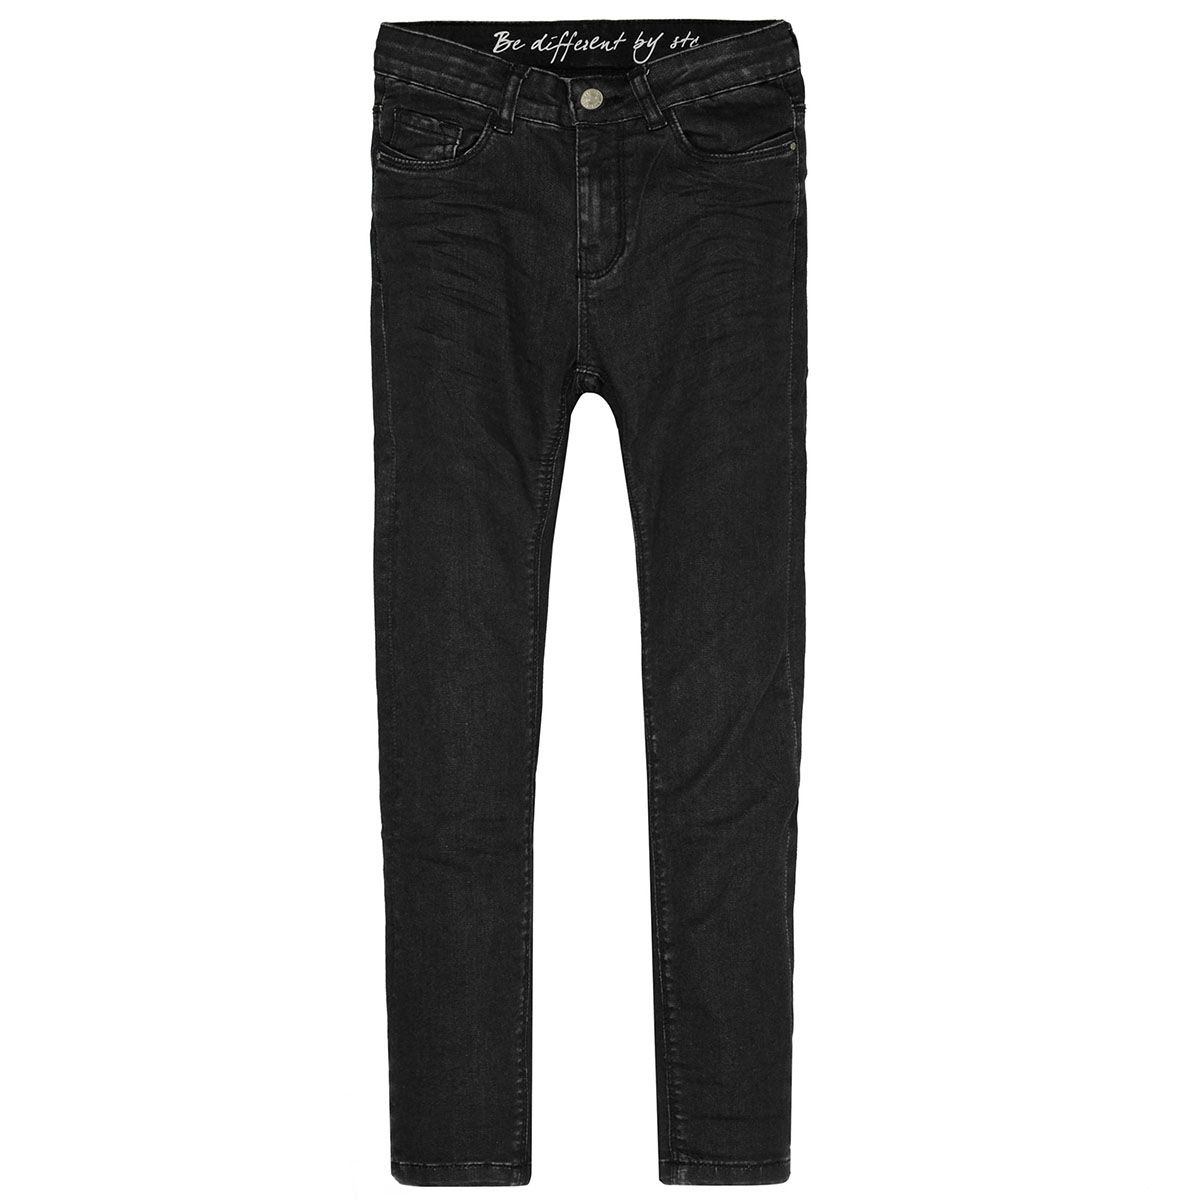 Mädchen Skinny Jeans Slim Fit - Black Denim